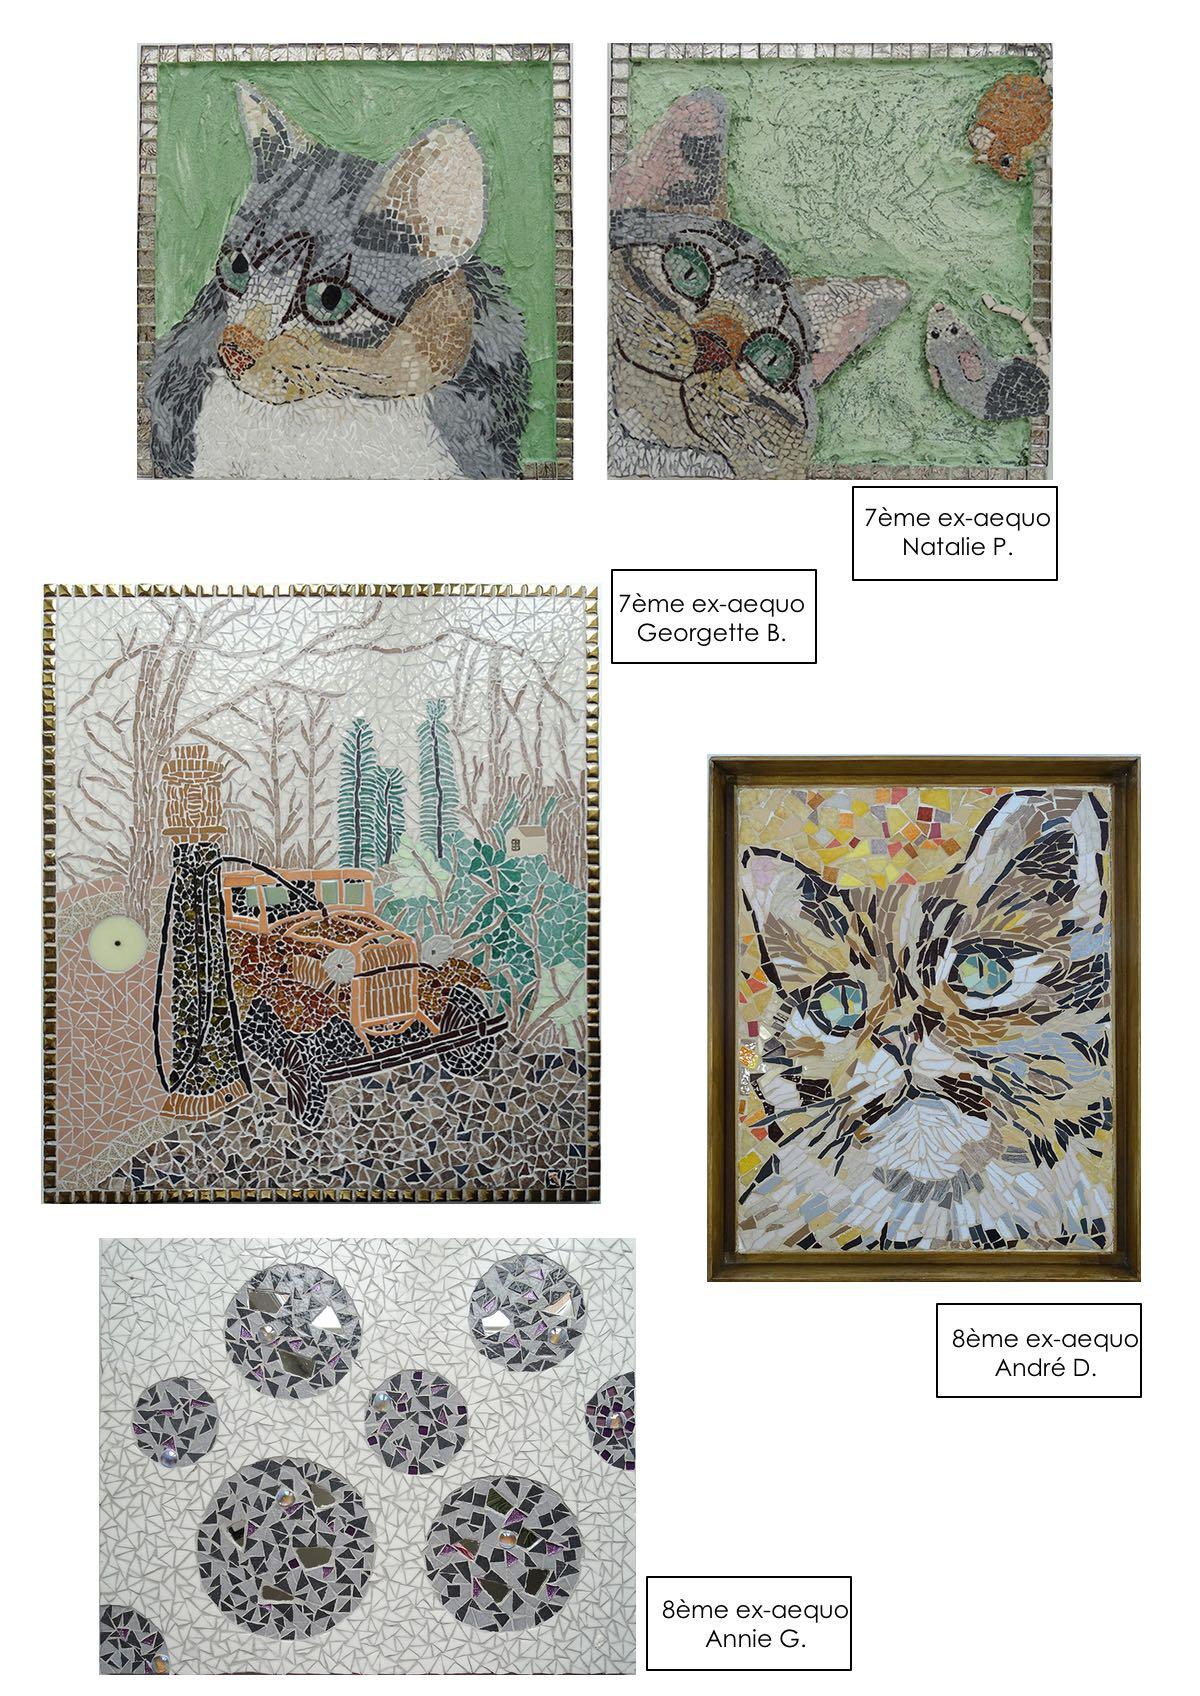 Chats en mosaïque